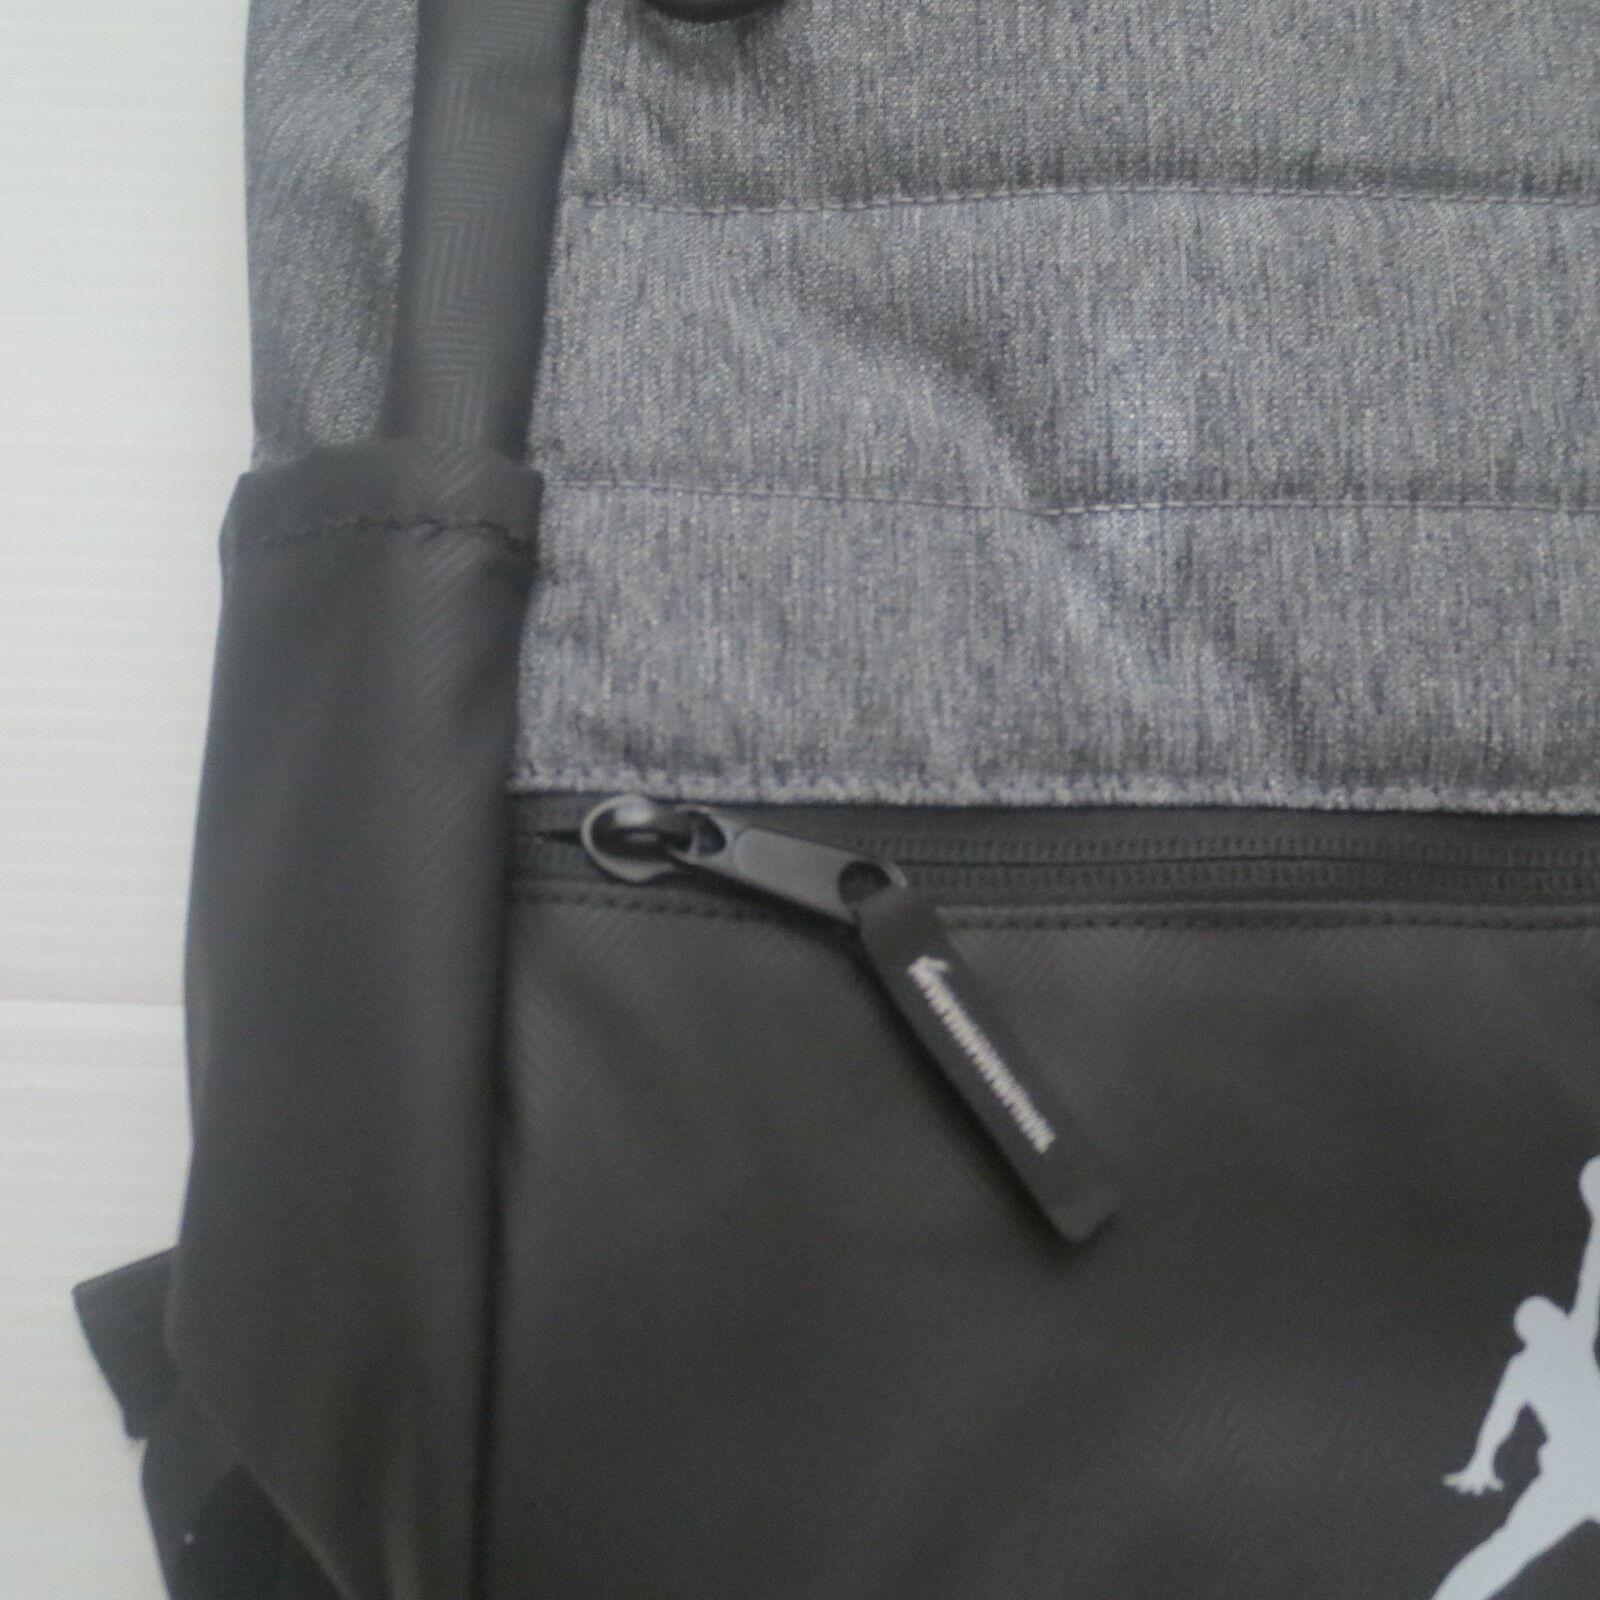 Nike Jordan Airborne Backpack - 9A1944 - Gray - NWT image 3